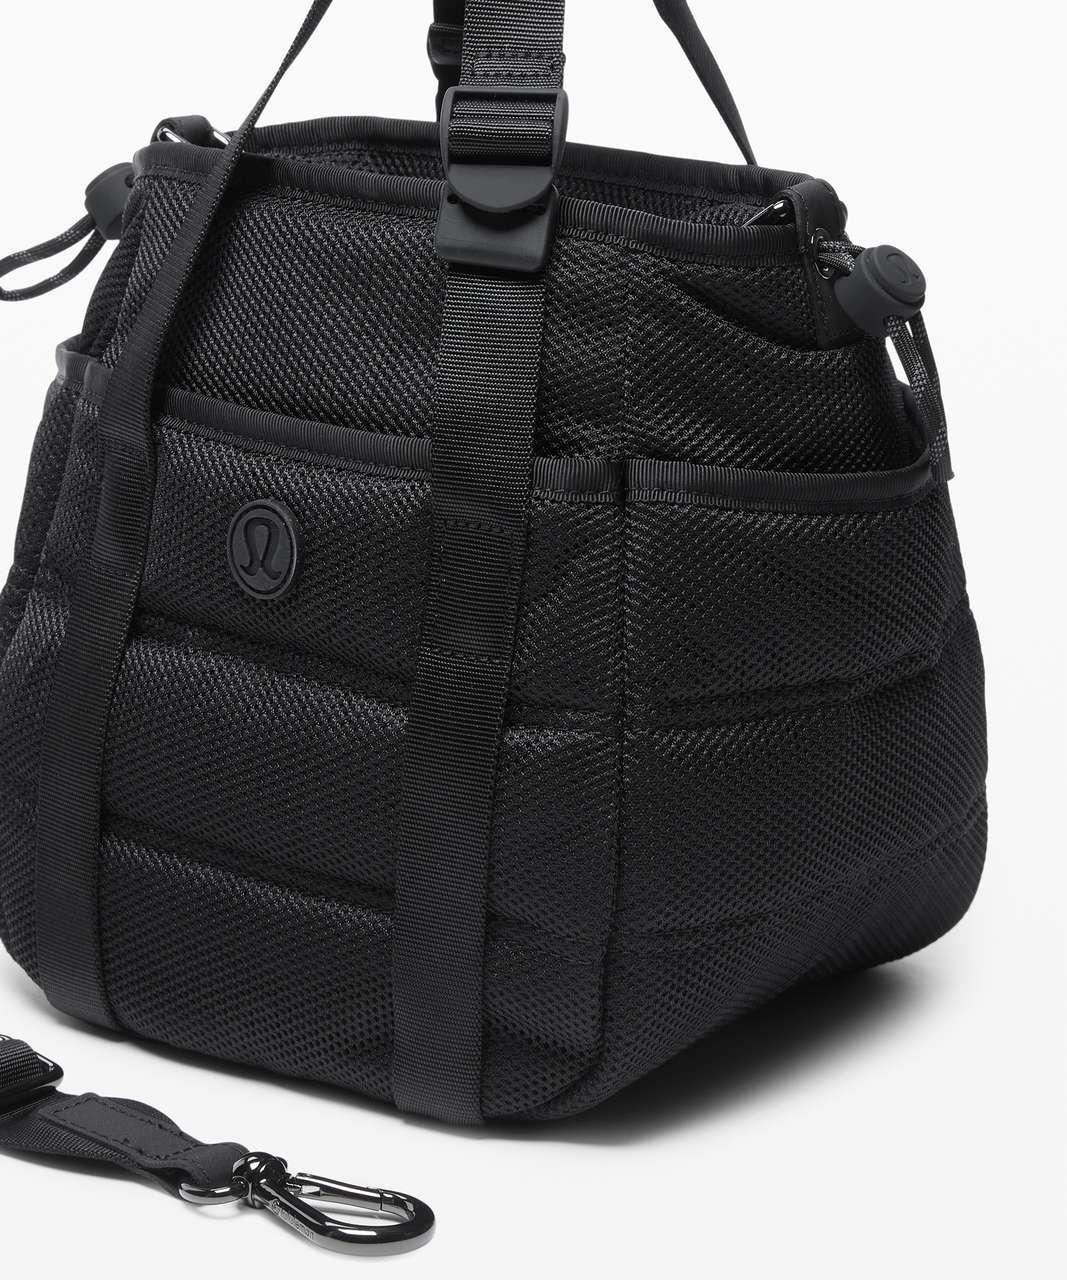 Lululemon Dash All Day Bucket Bag *6.5L - Black